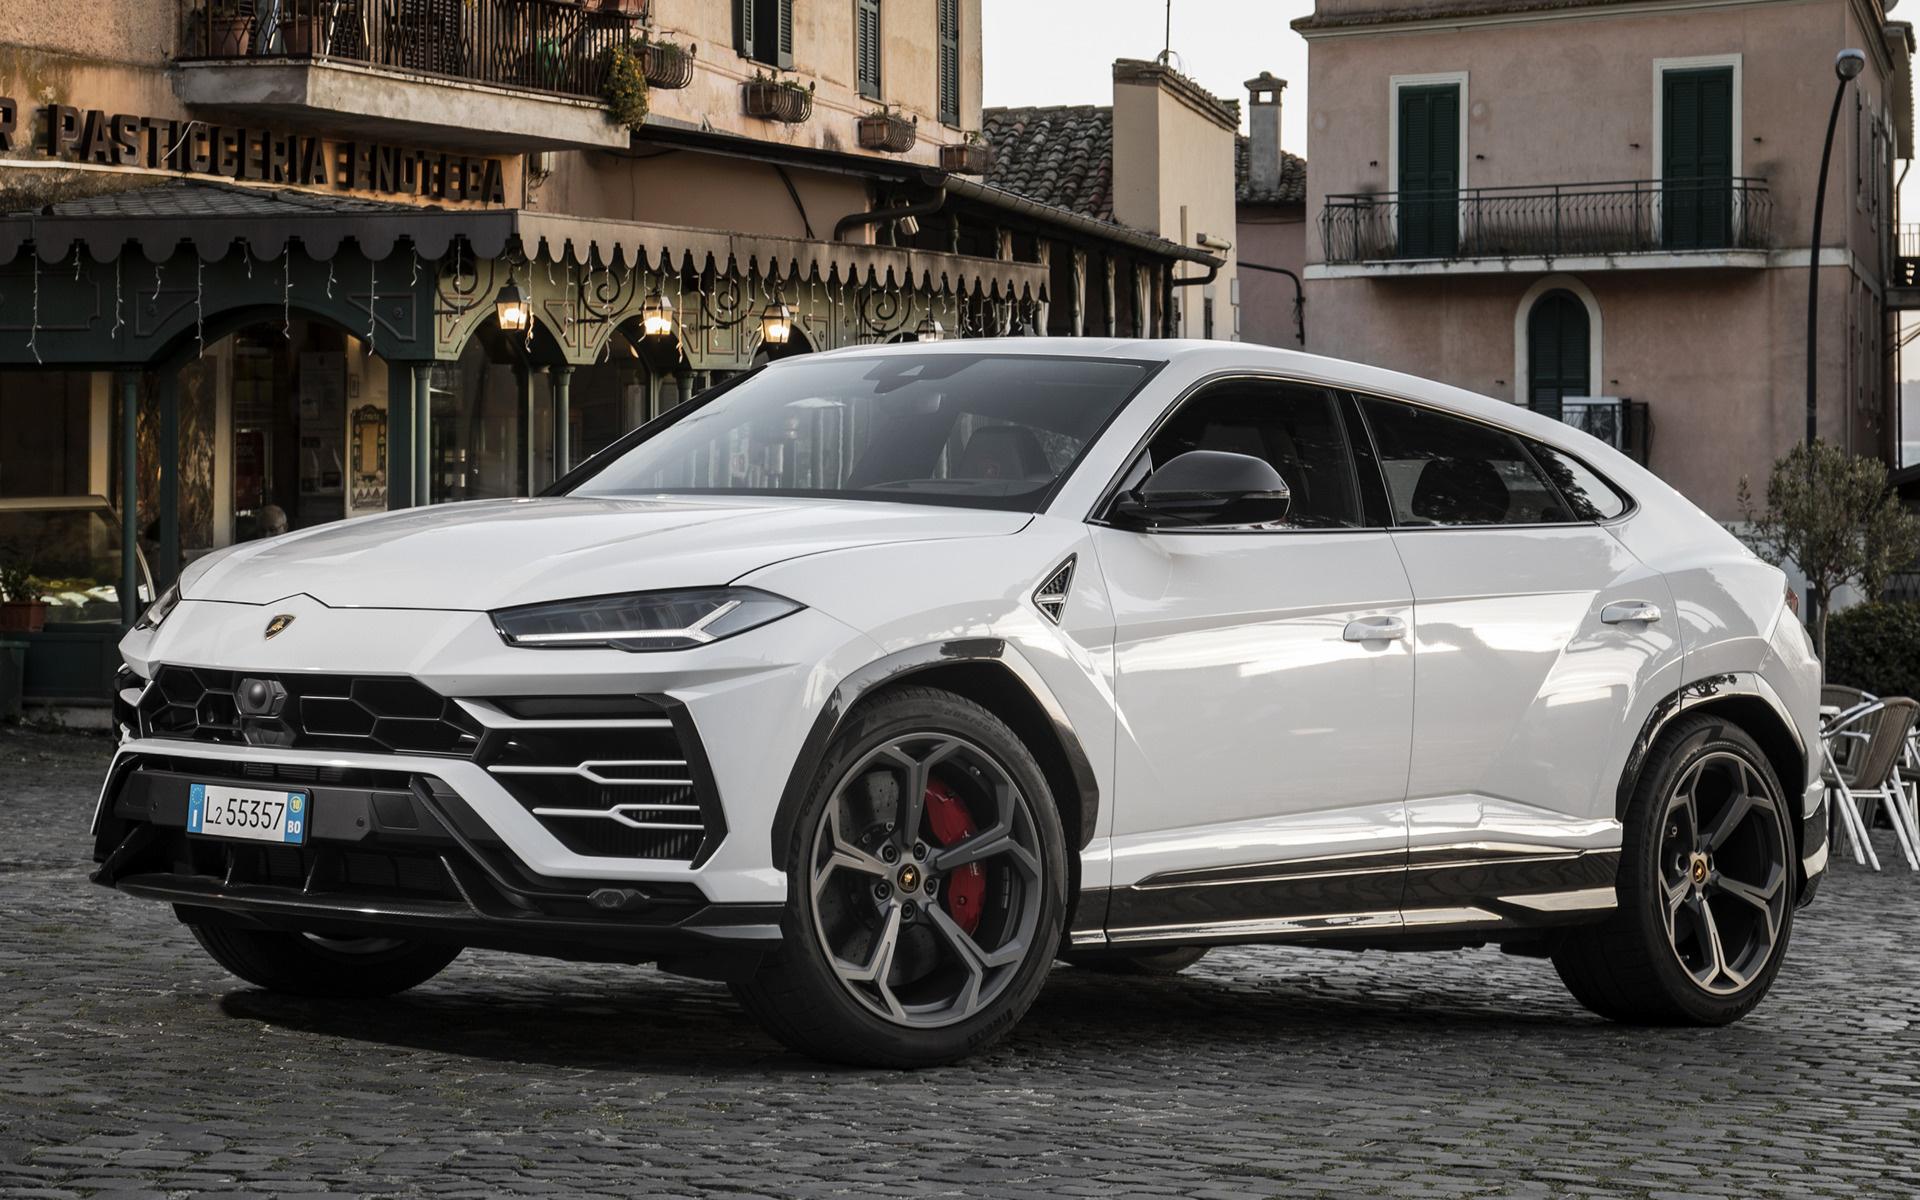 2018 Lamborghini Urus Carbon Package - Wallpapers and HD ...